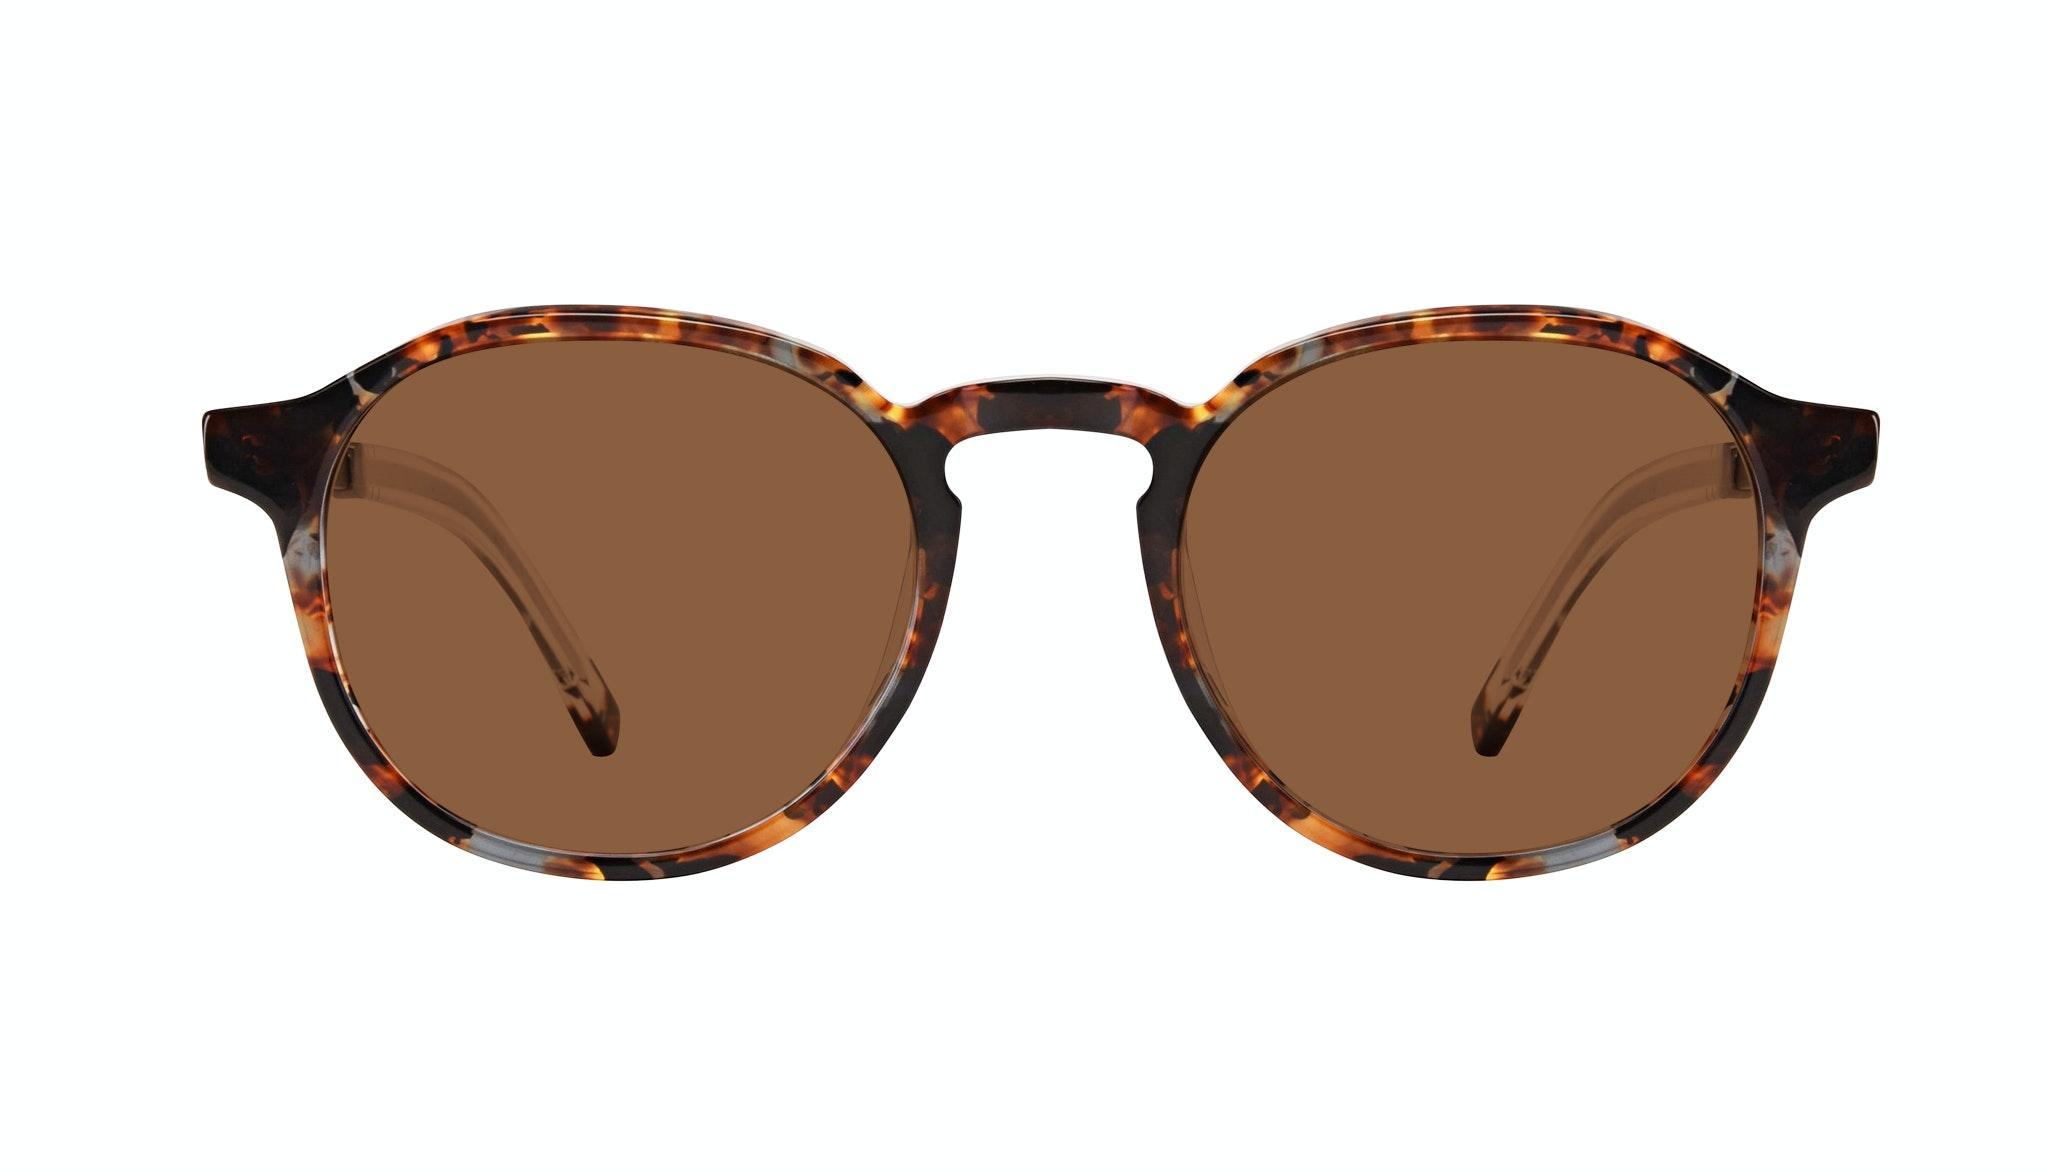 Affordable Fashion Glasses Round Sunglasses Men Prime XL Mahogany